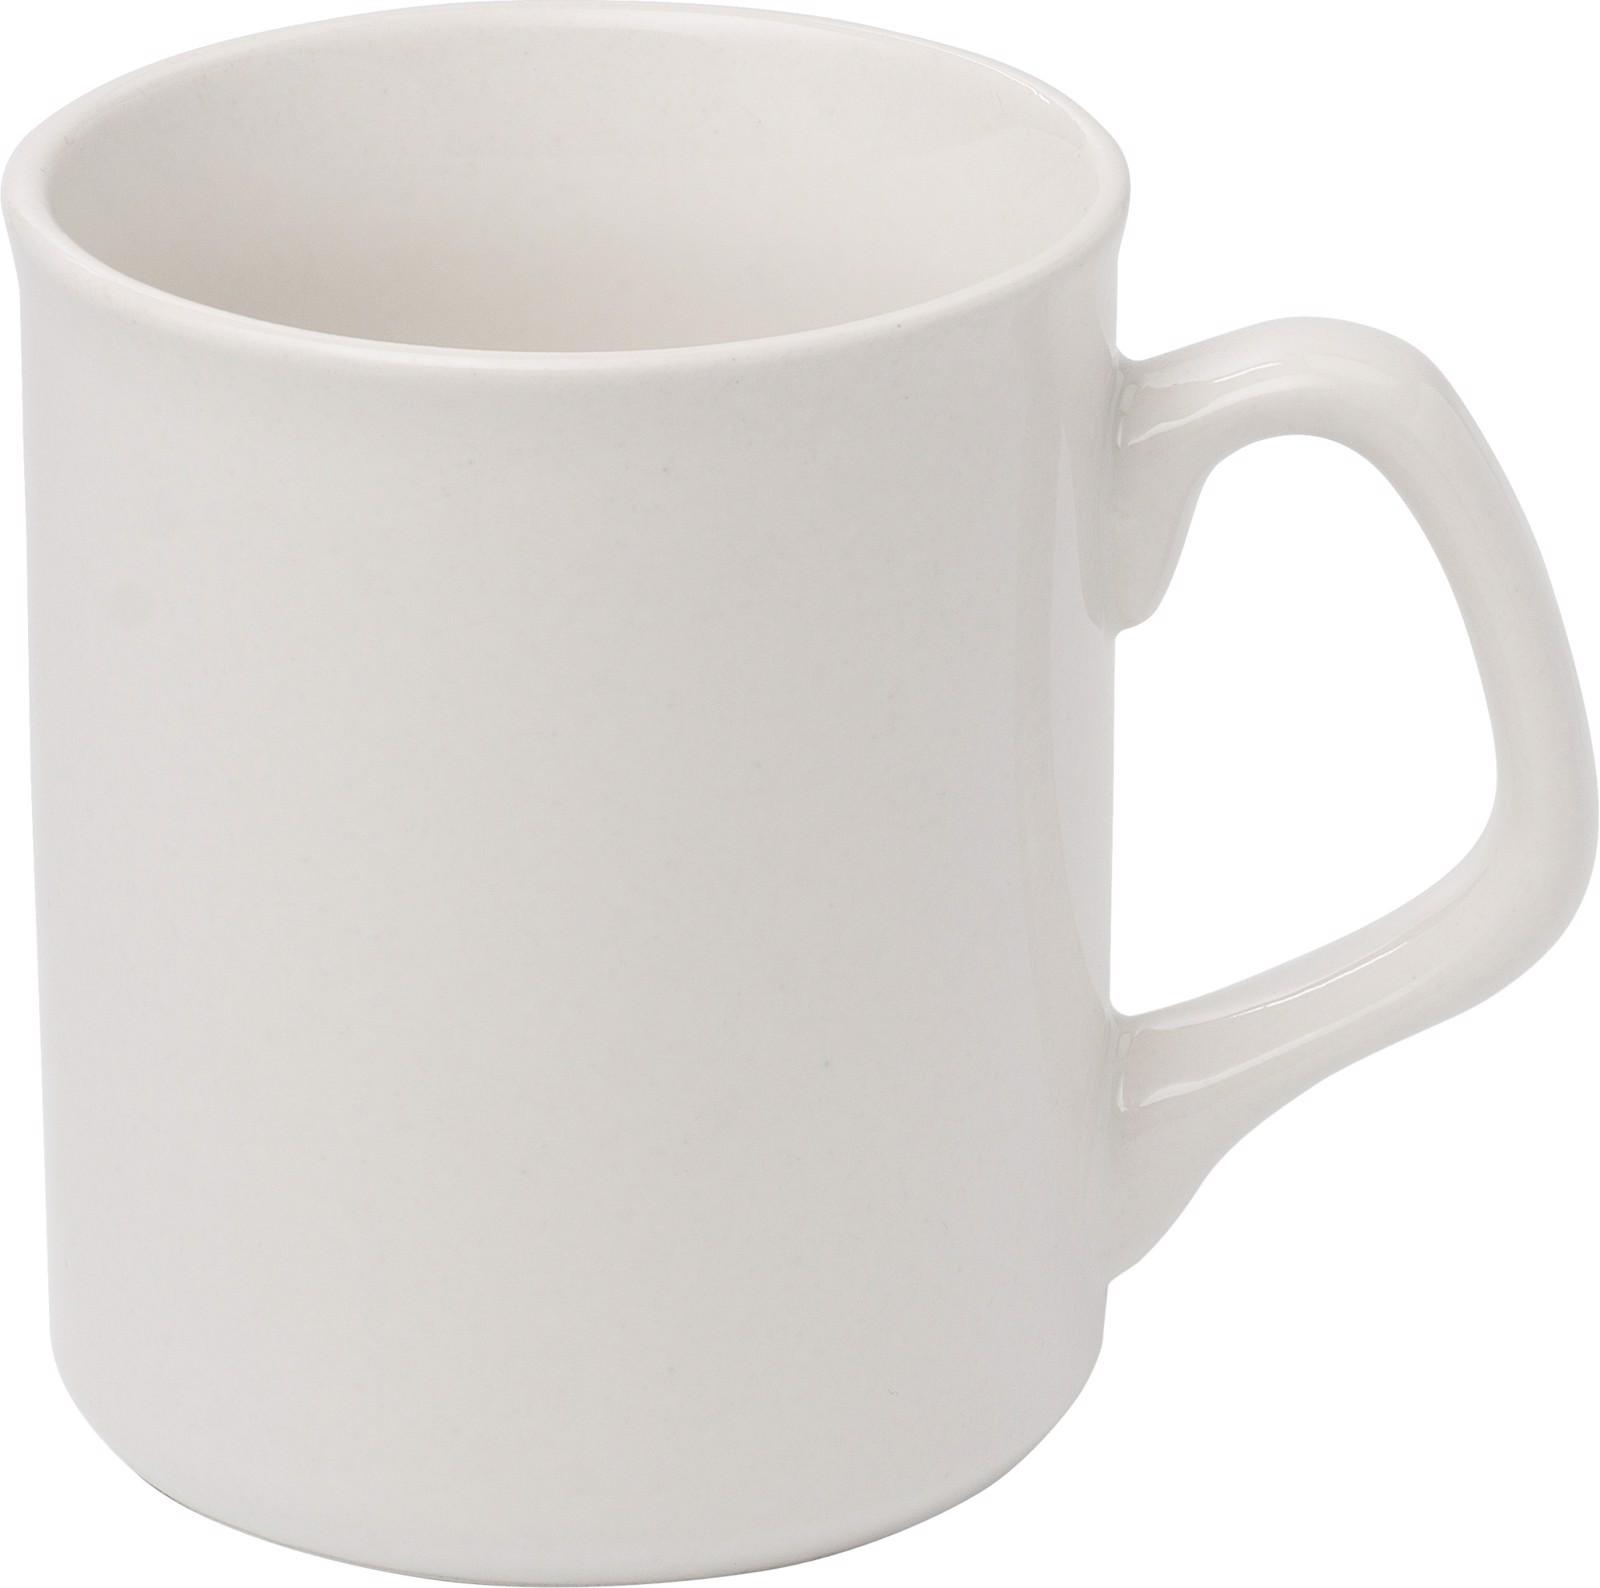 Porcelain mug - White